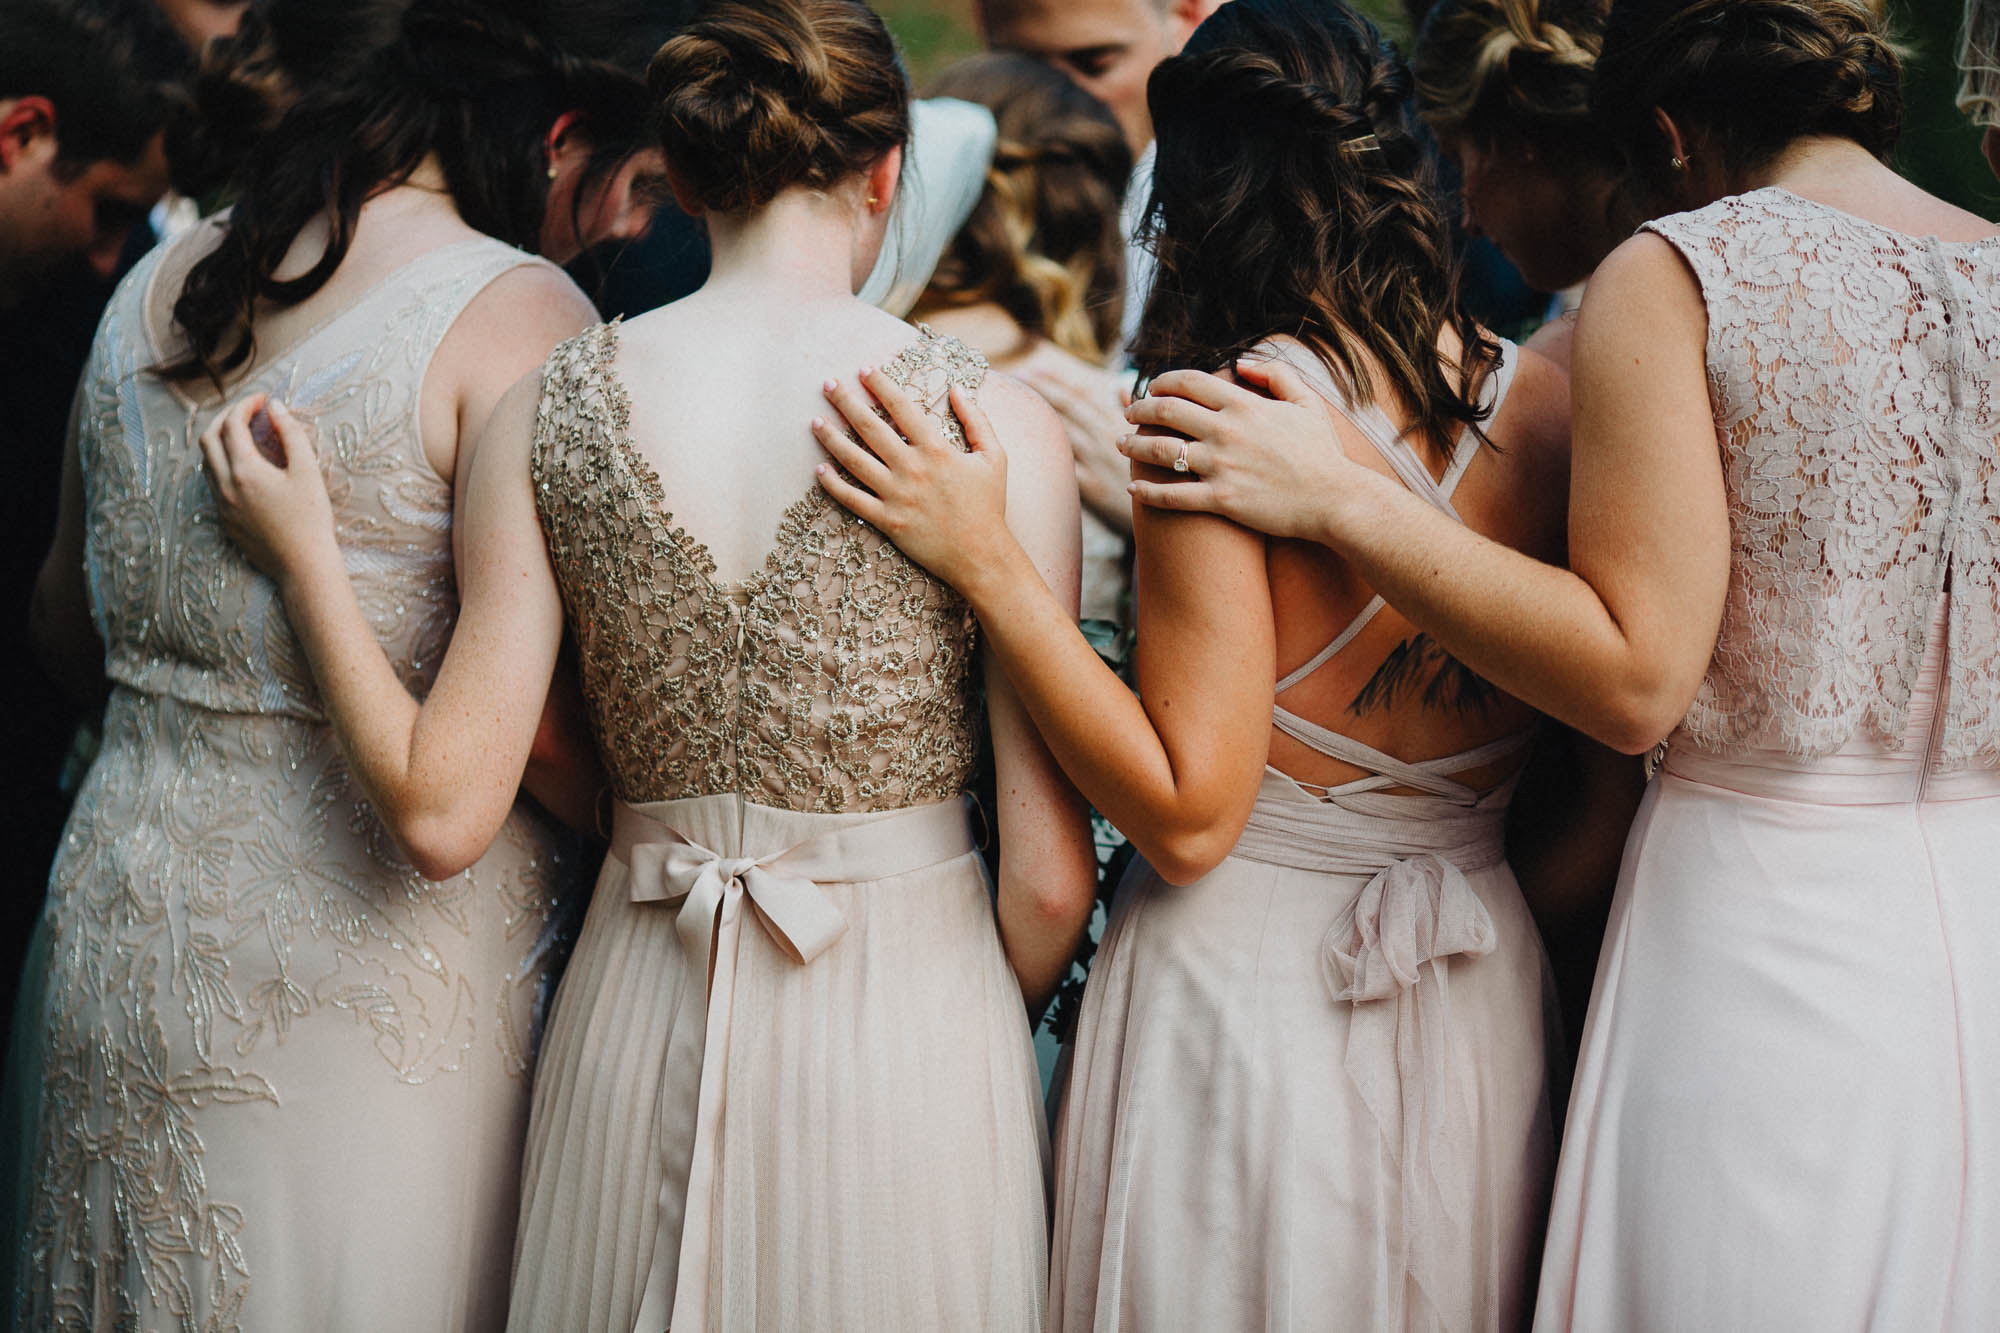 Bridesmaids Pray During an Outdoor Wedding Ceremony in Ohio